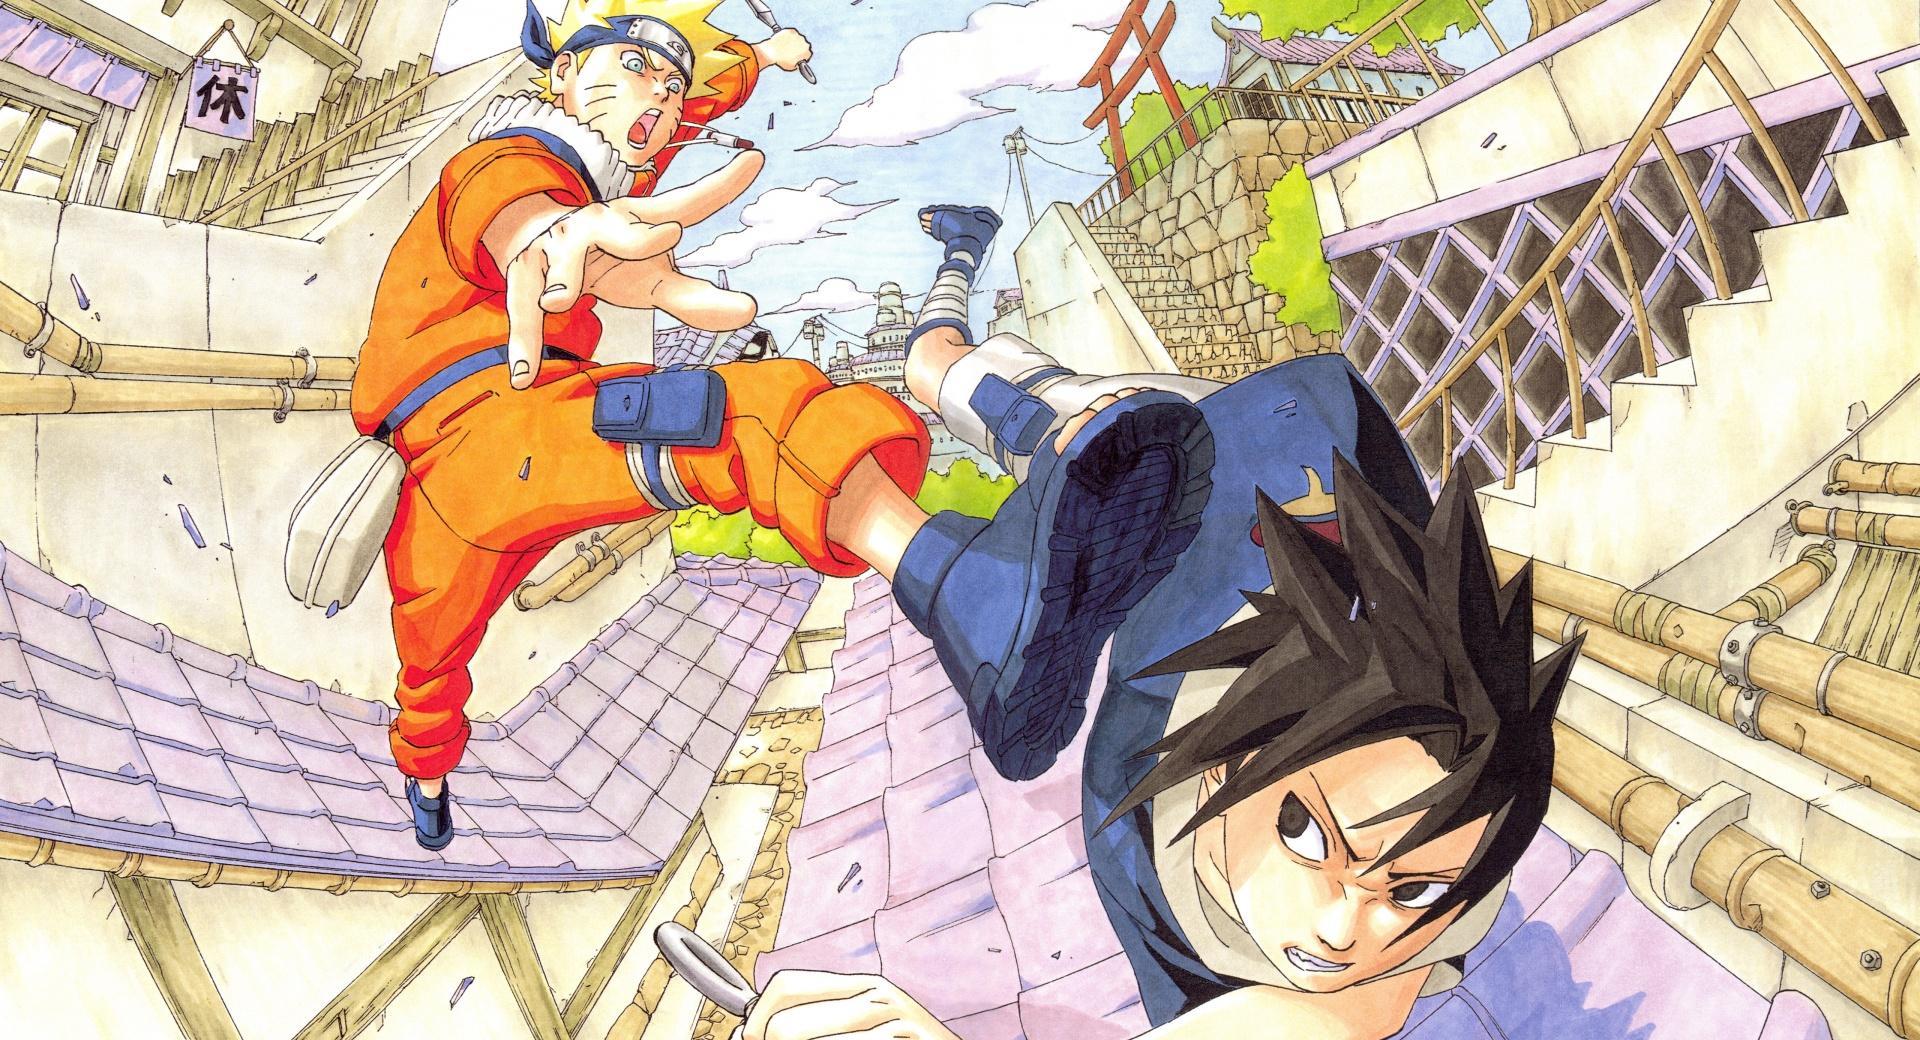 Naruto vs Sasuke - Part 1 wallpapers HD quality